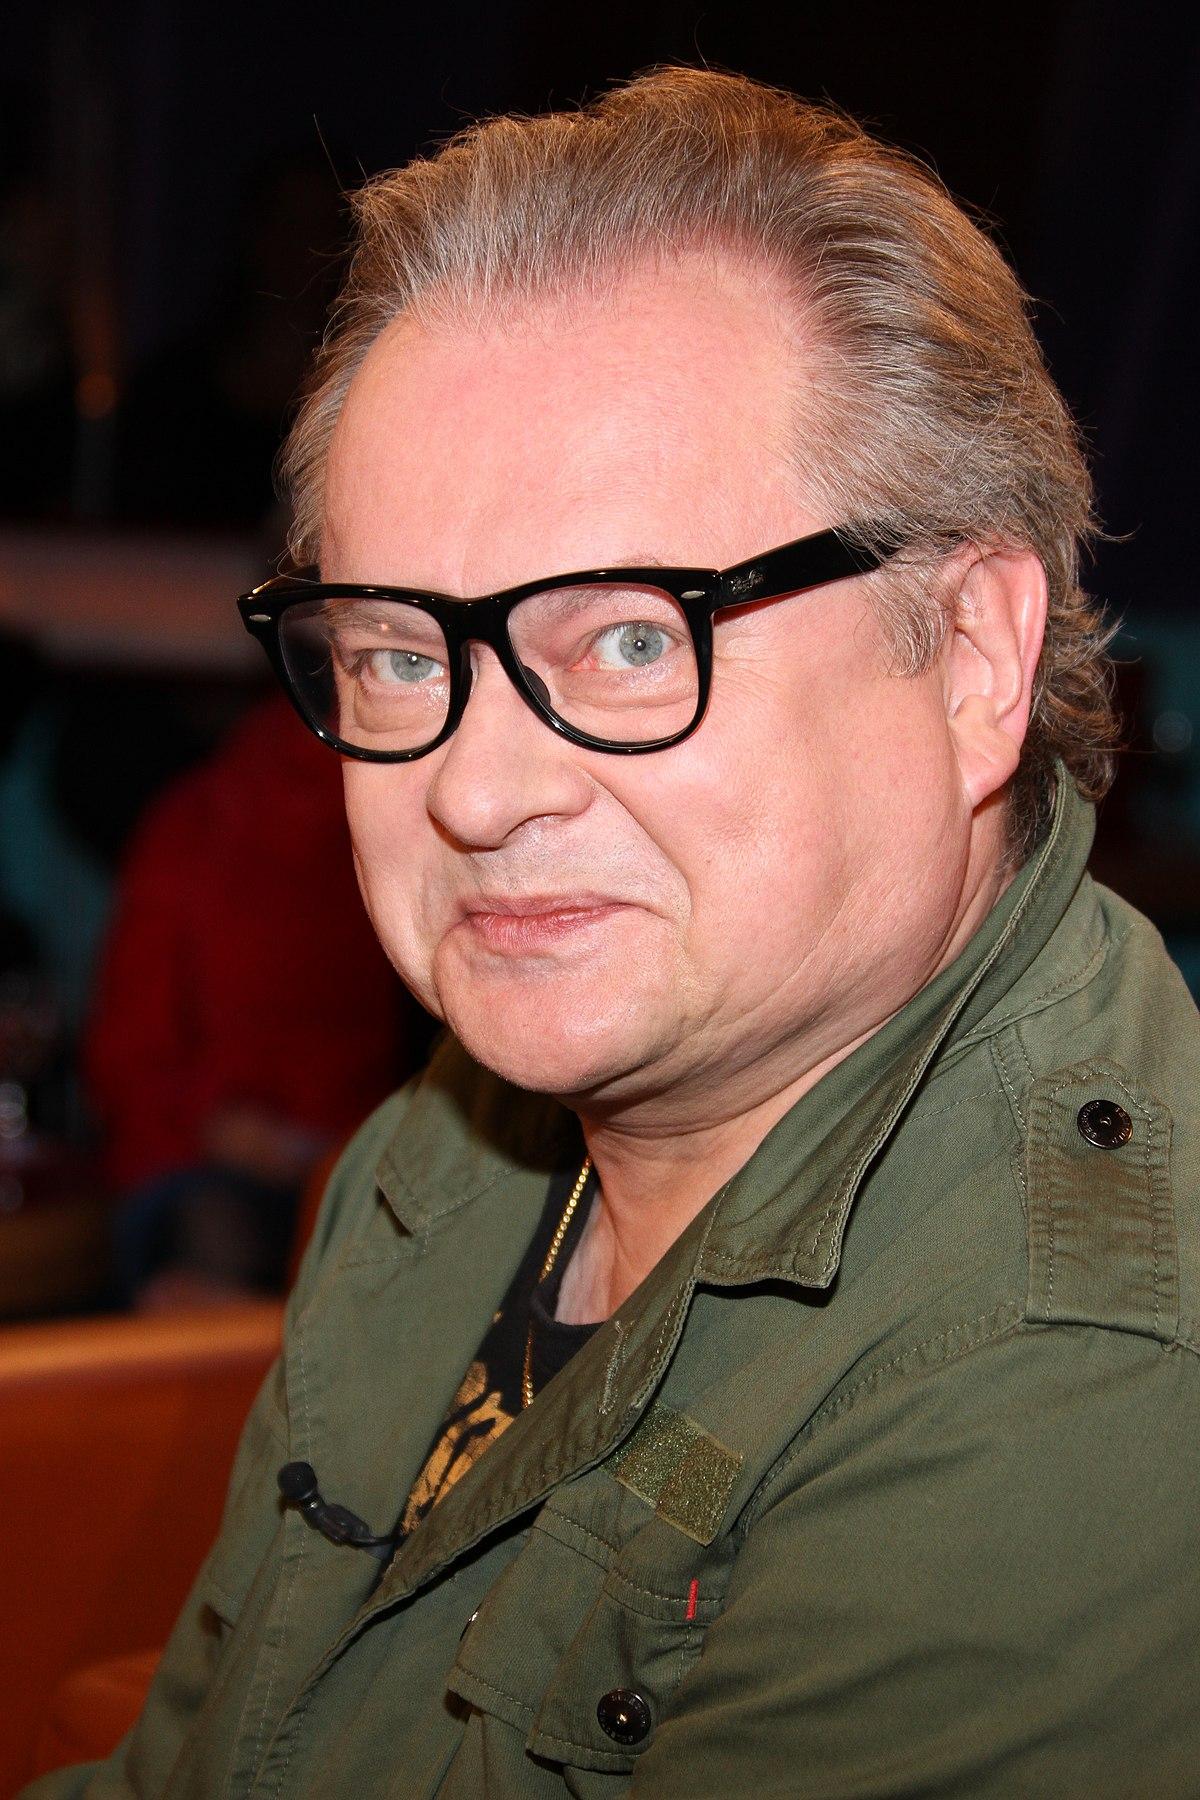 Heinz Rudolf